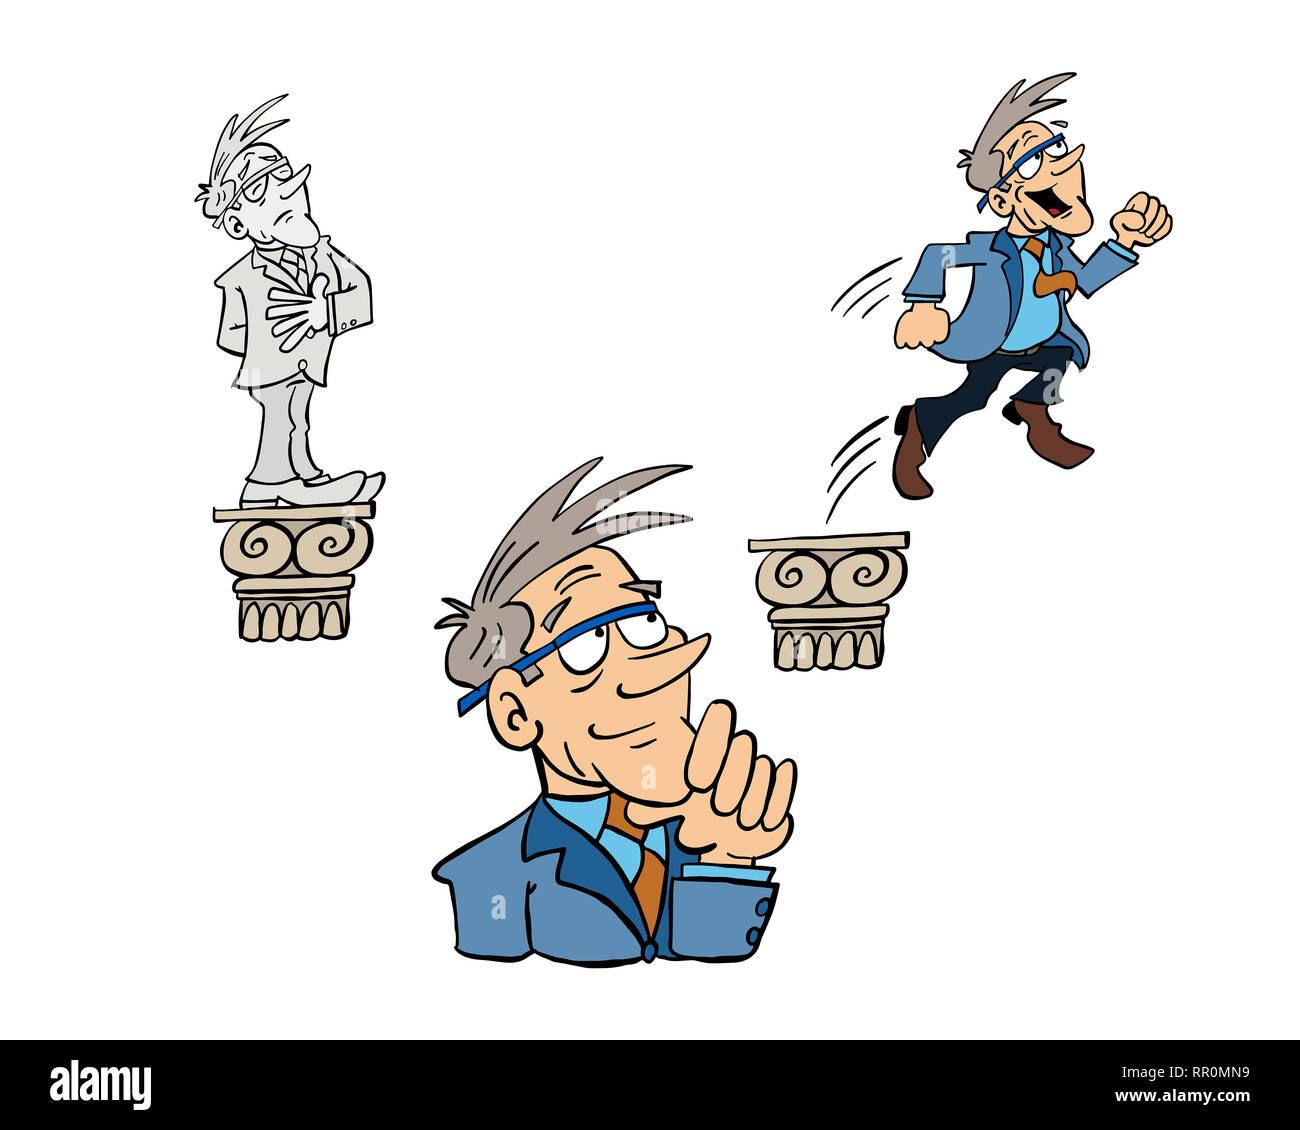 Growth mindset and fixed mindset - Bertrand - Stock Image